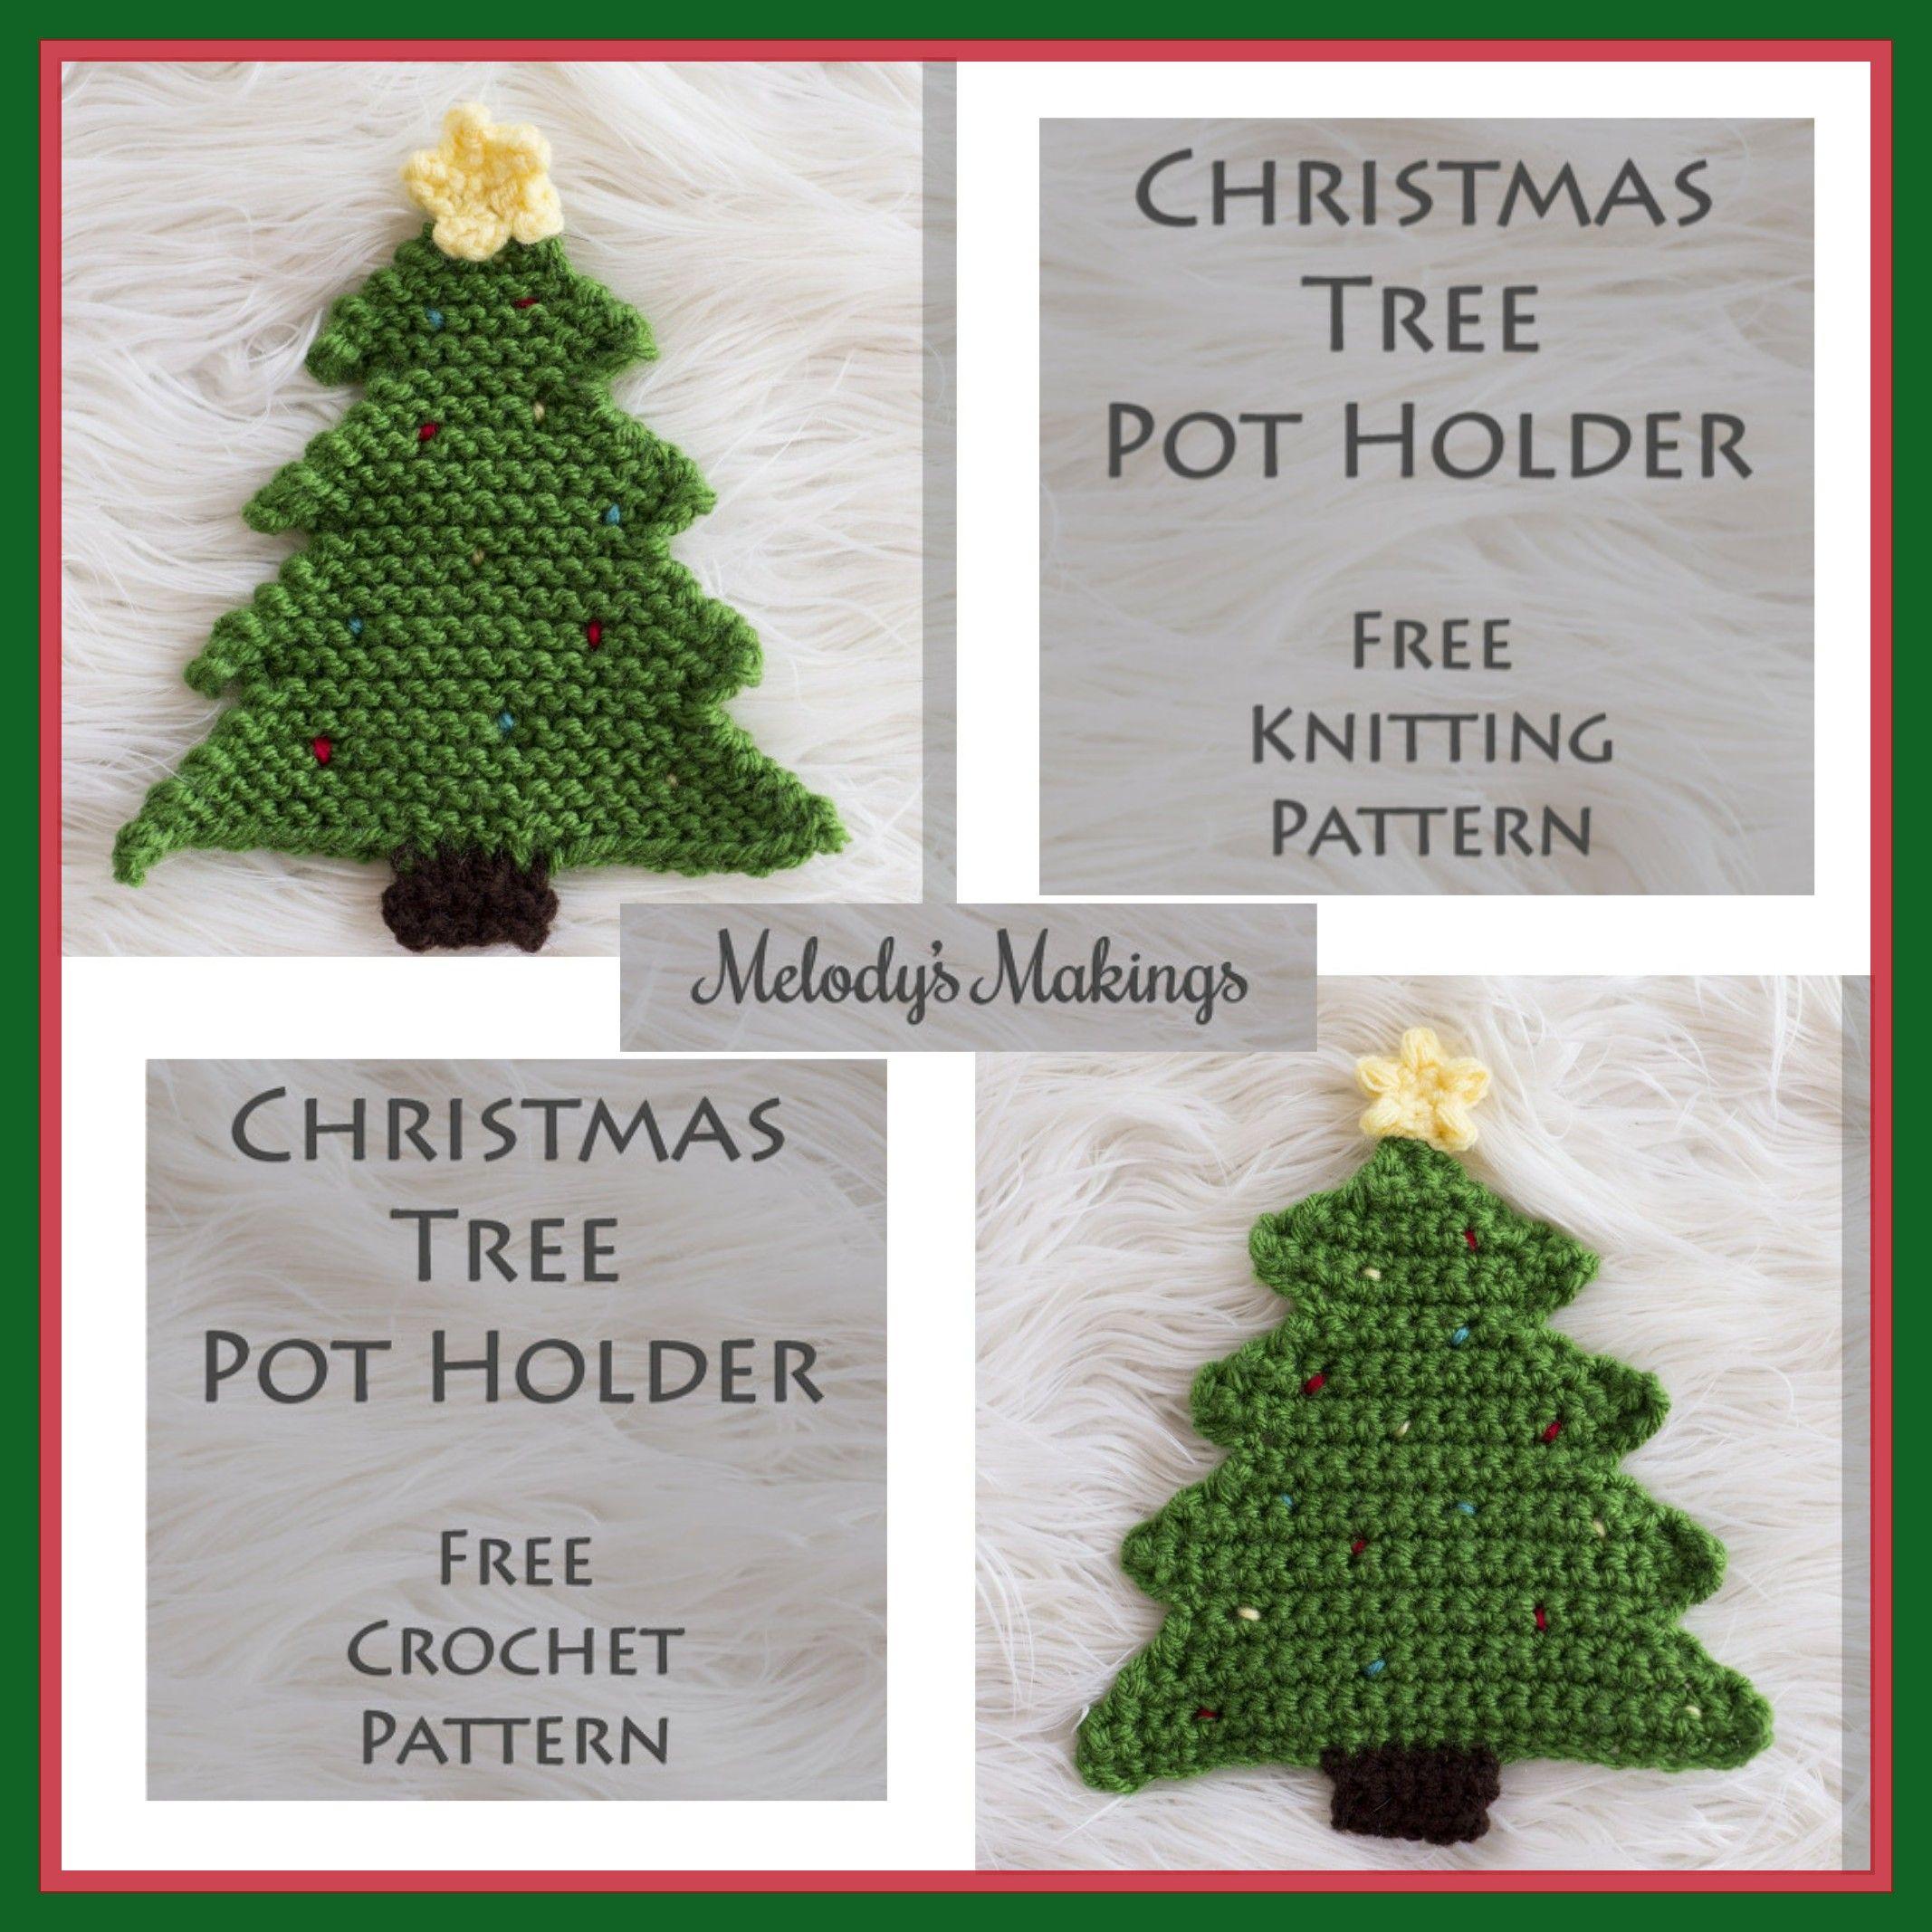 Christmas Tree Pot Holder Crochet Pattern Diy And Crafts Sewing Crochet Patterns Crochet